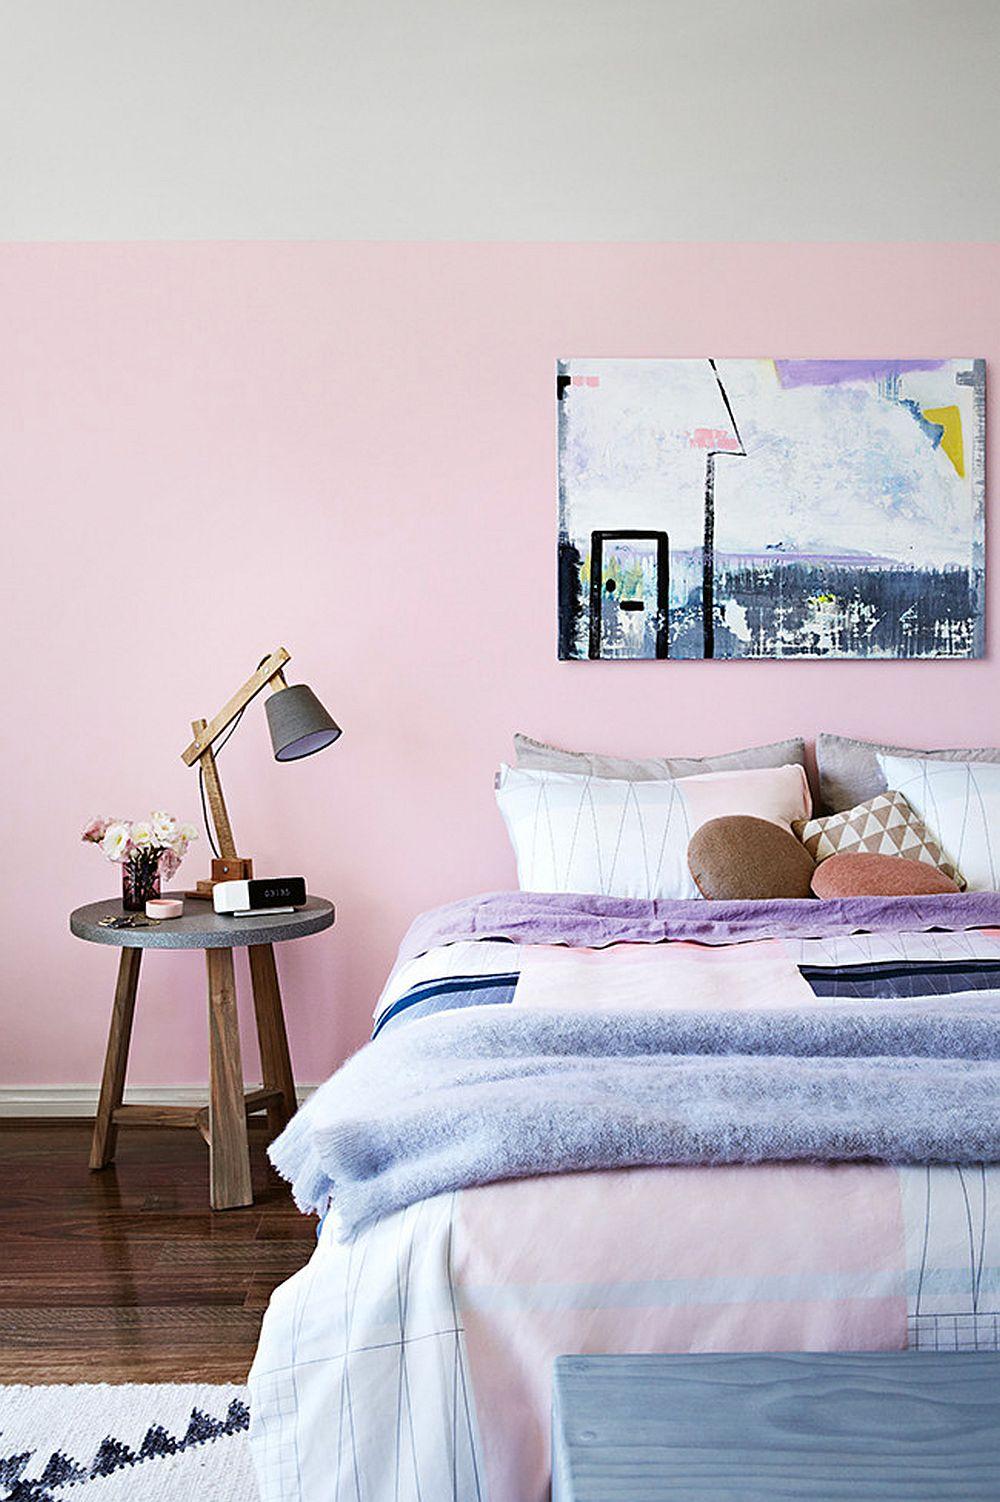 adelaparvu.com despre acelasi dormitor 2 variante de decorare, stilist Julia Green, Foto Armelle Habib  (4)